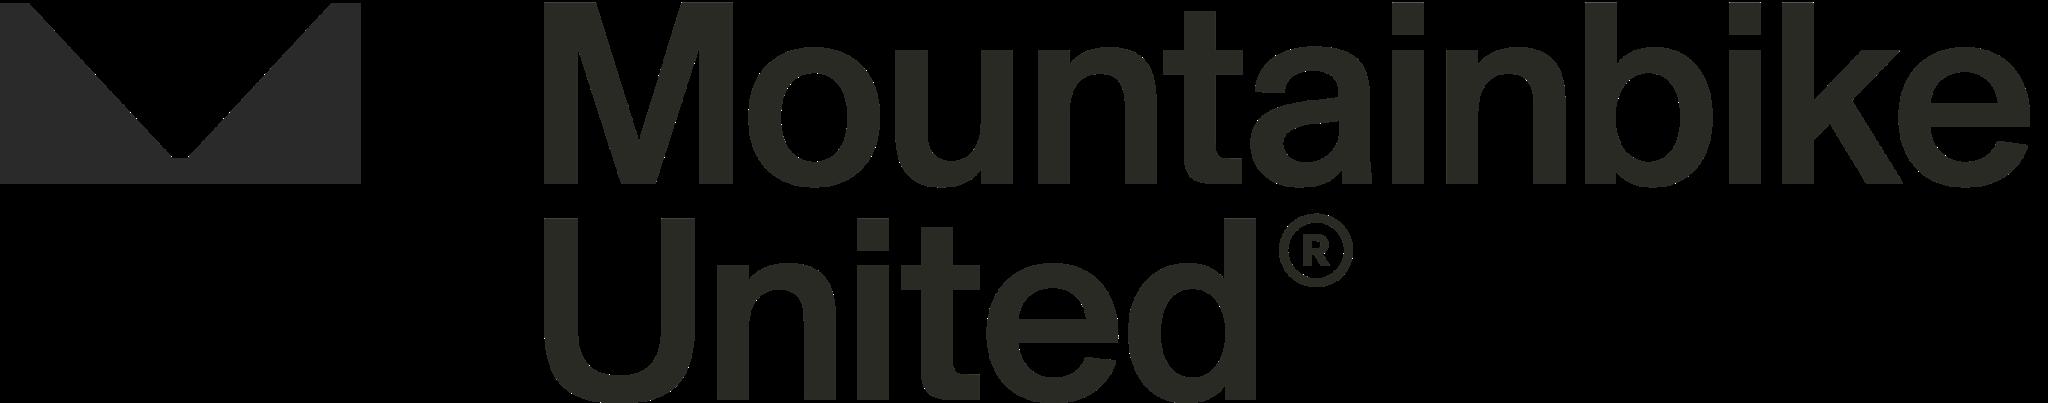 MTBUTD_RGB_Black_Logo.png